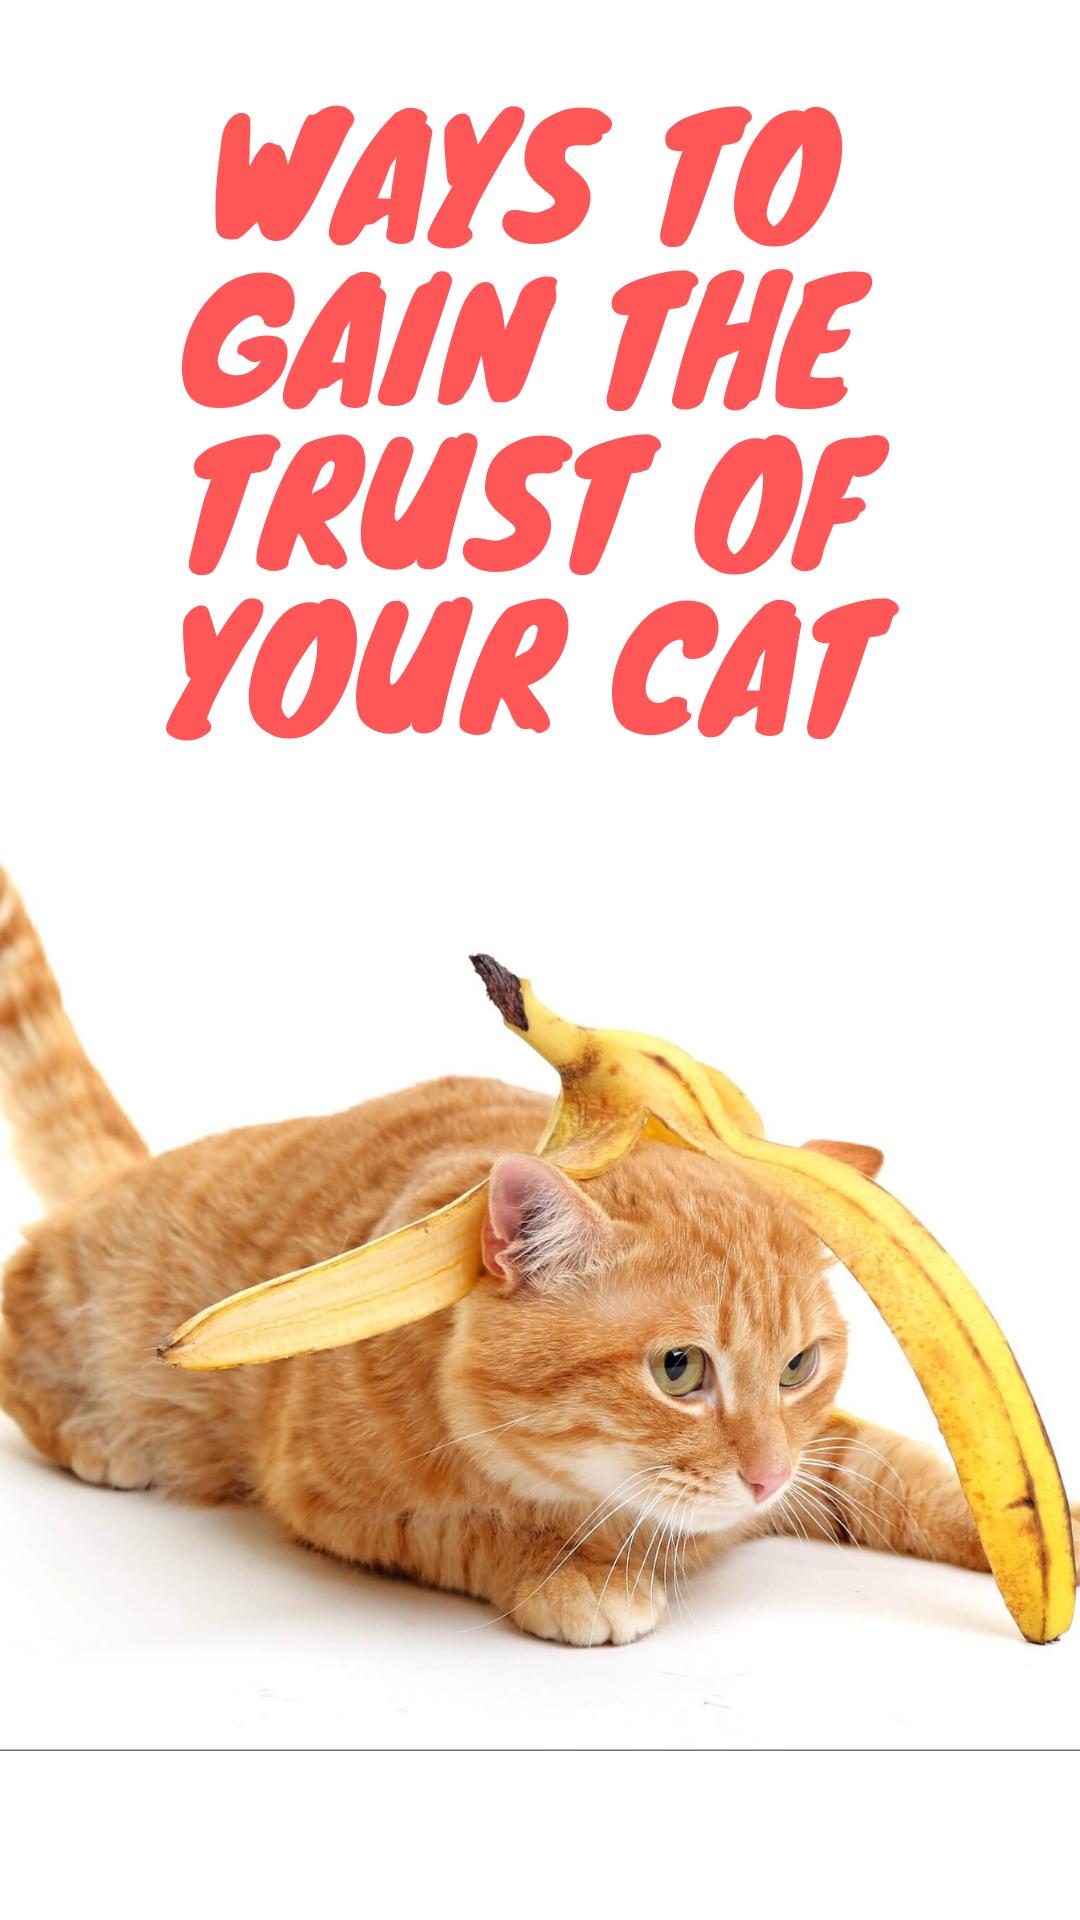 7b72e81b76388a9c2ed4469faa53aa65 - How To Get A Wild Kitten To Trust You